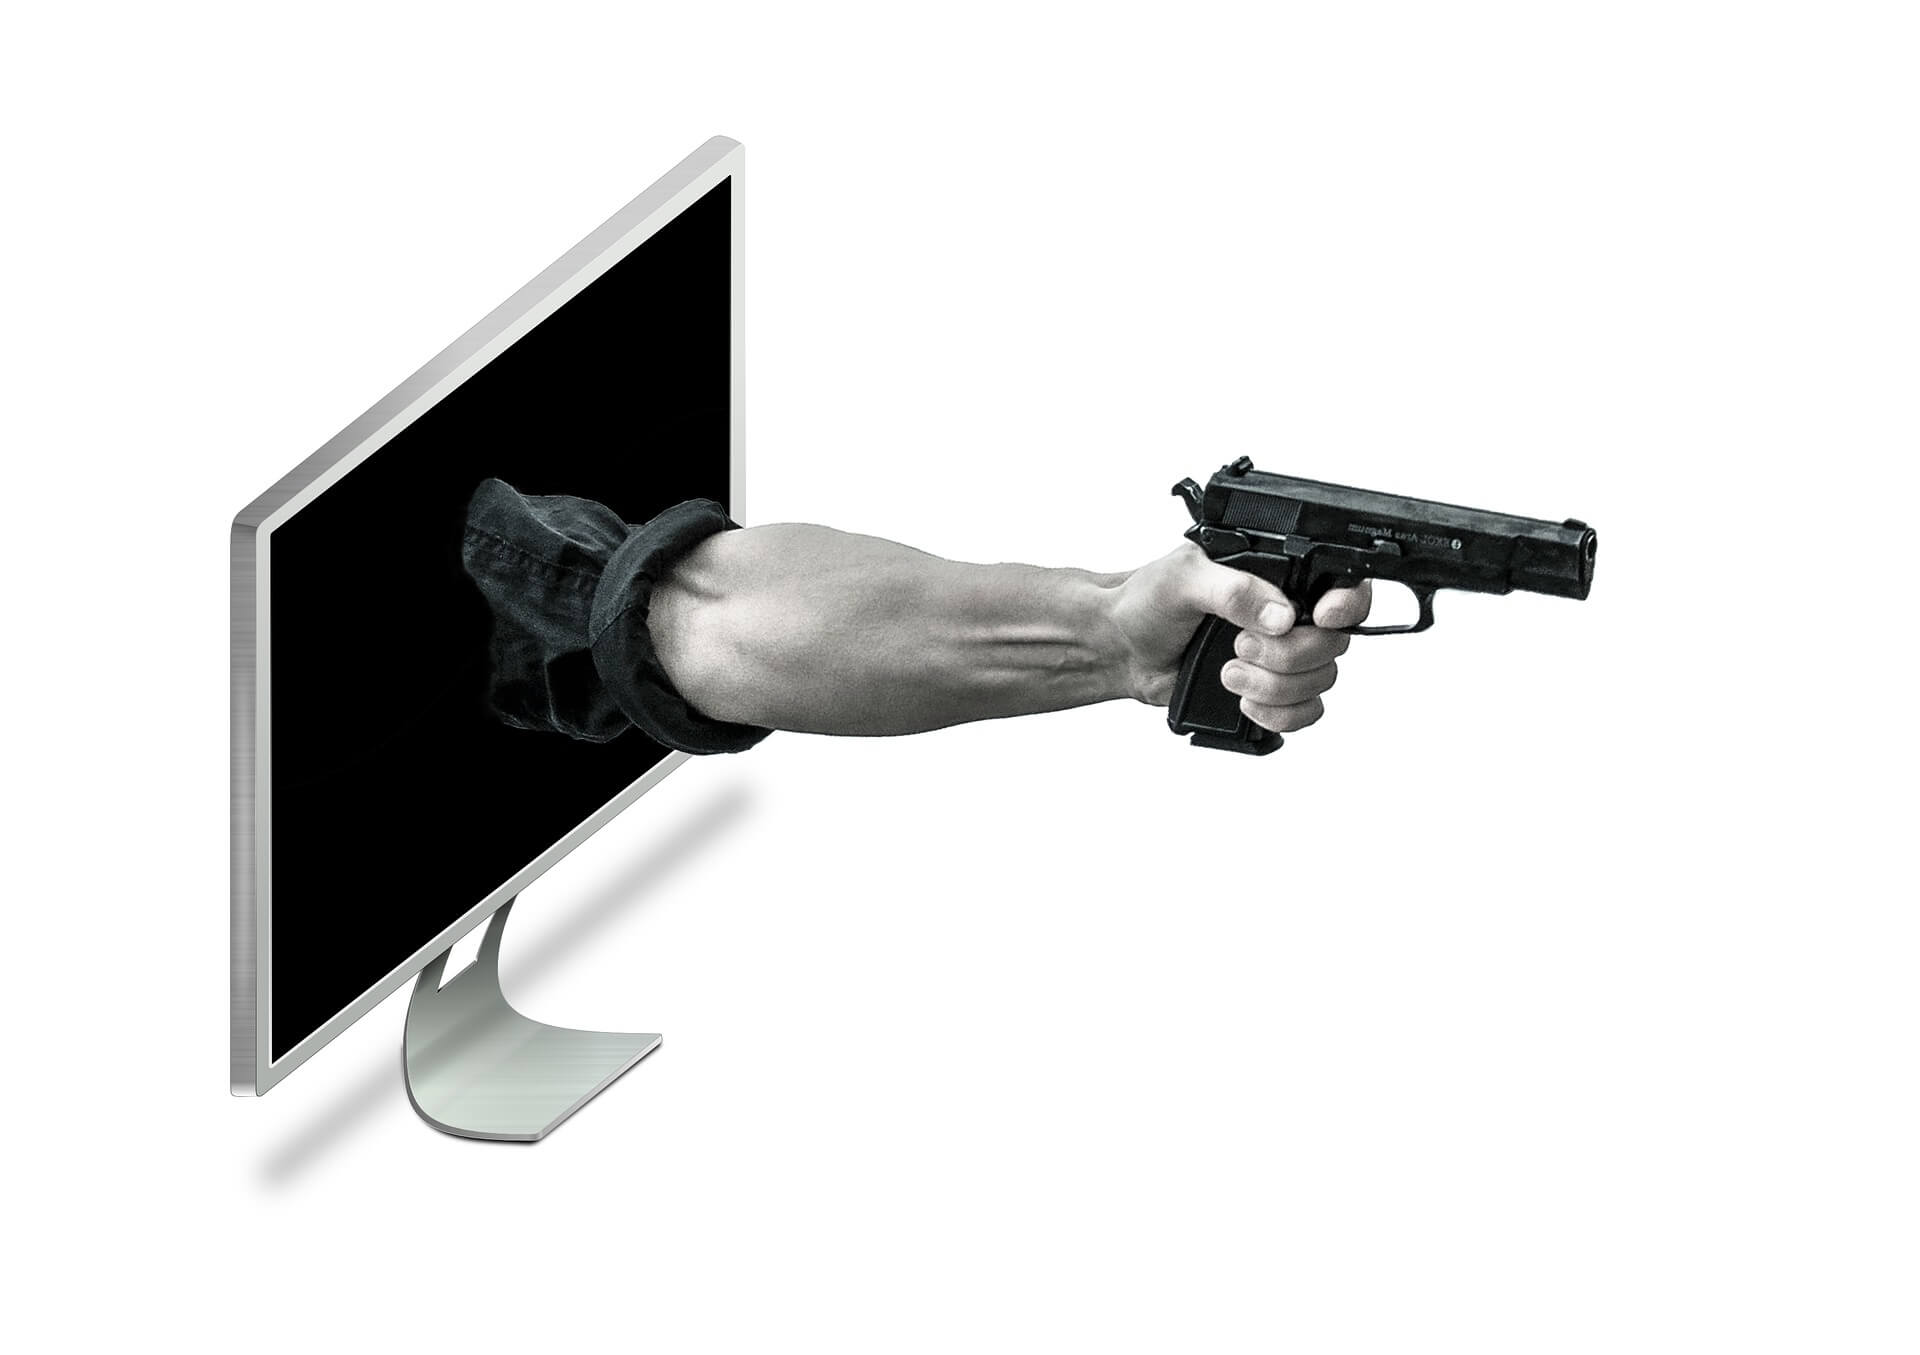 cybercrime hand with a gun exits computer screen